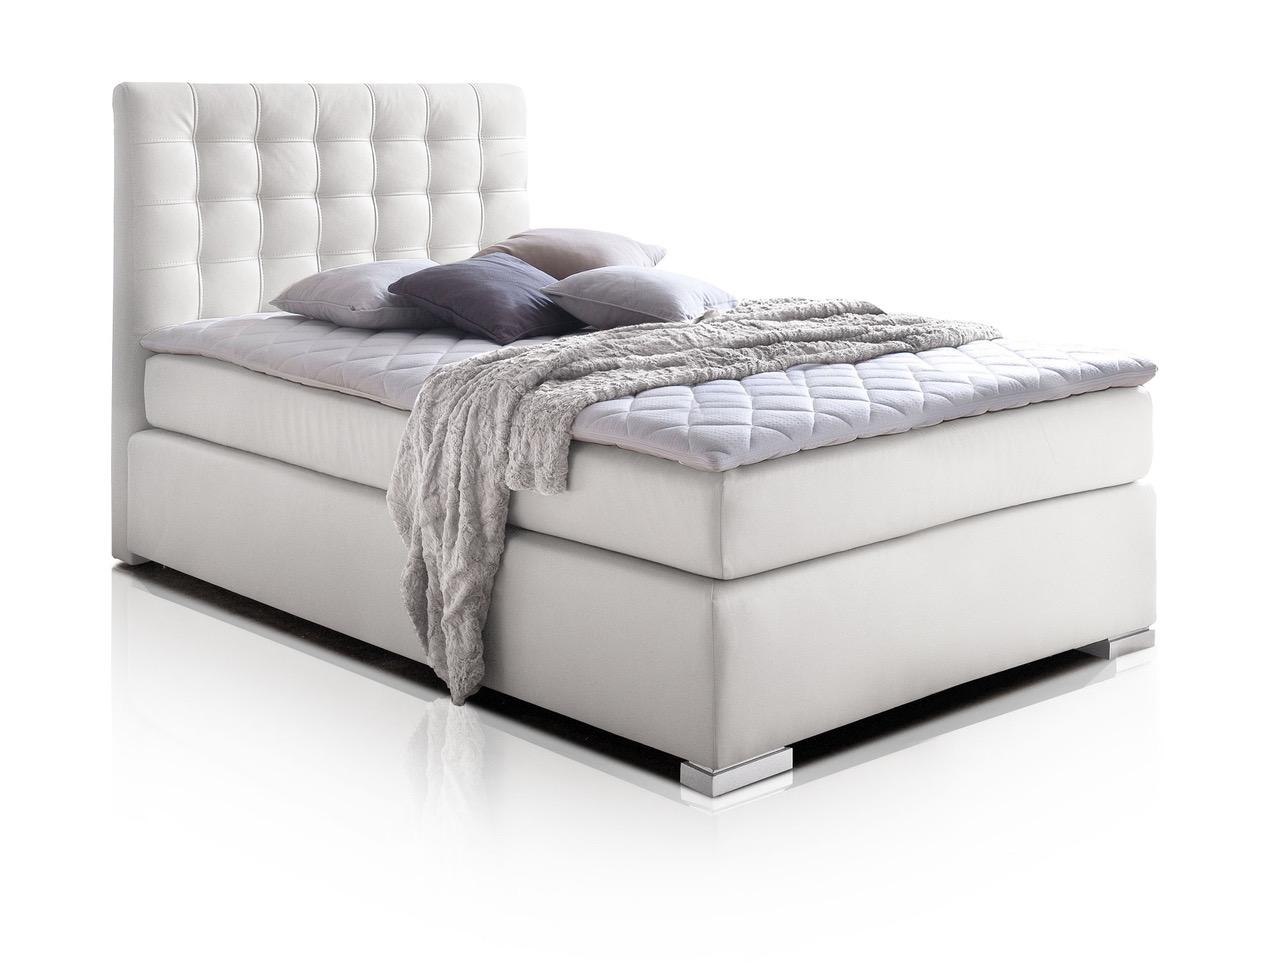 isabell boxspringbett 90 x 200 cm weiss h rtegrad 2. Black Bedroom Furniture Sets. Home Design Ideas